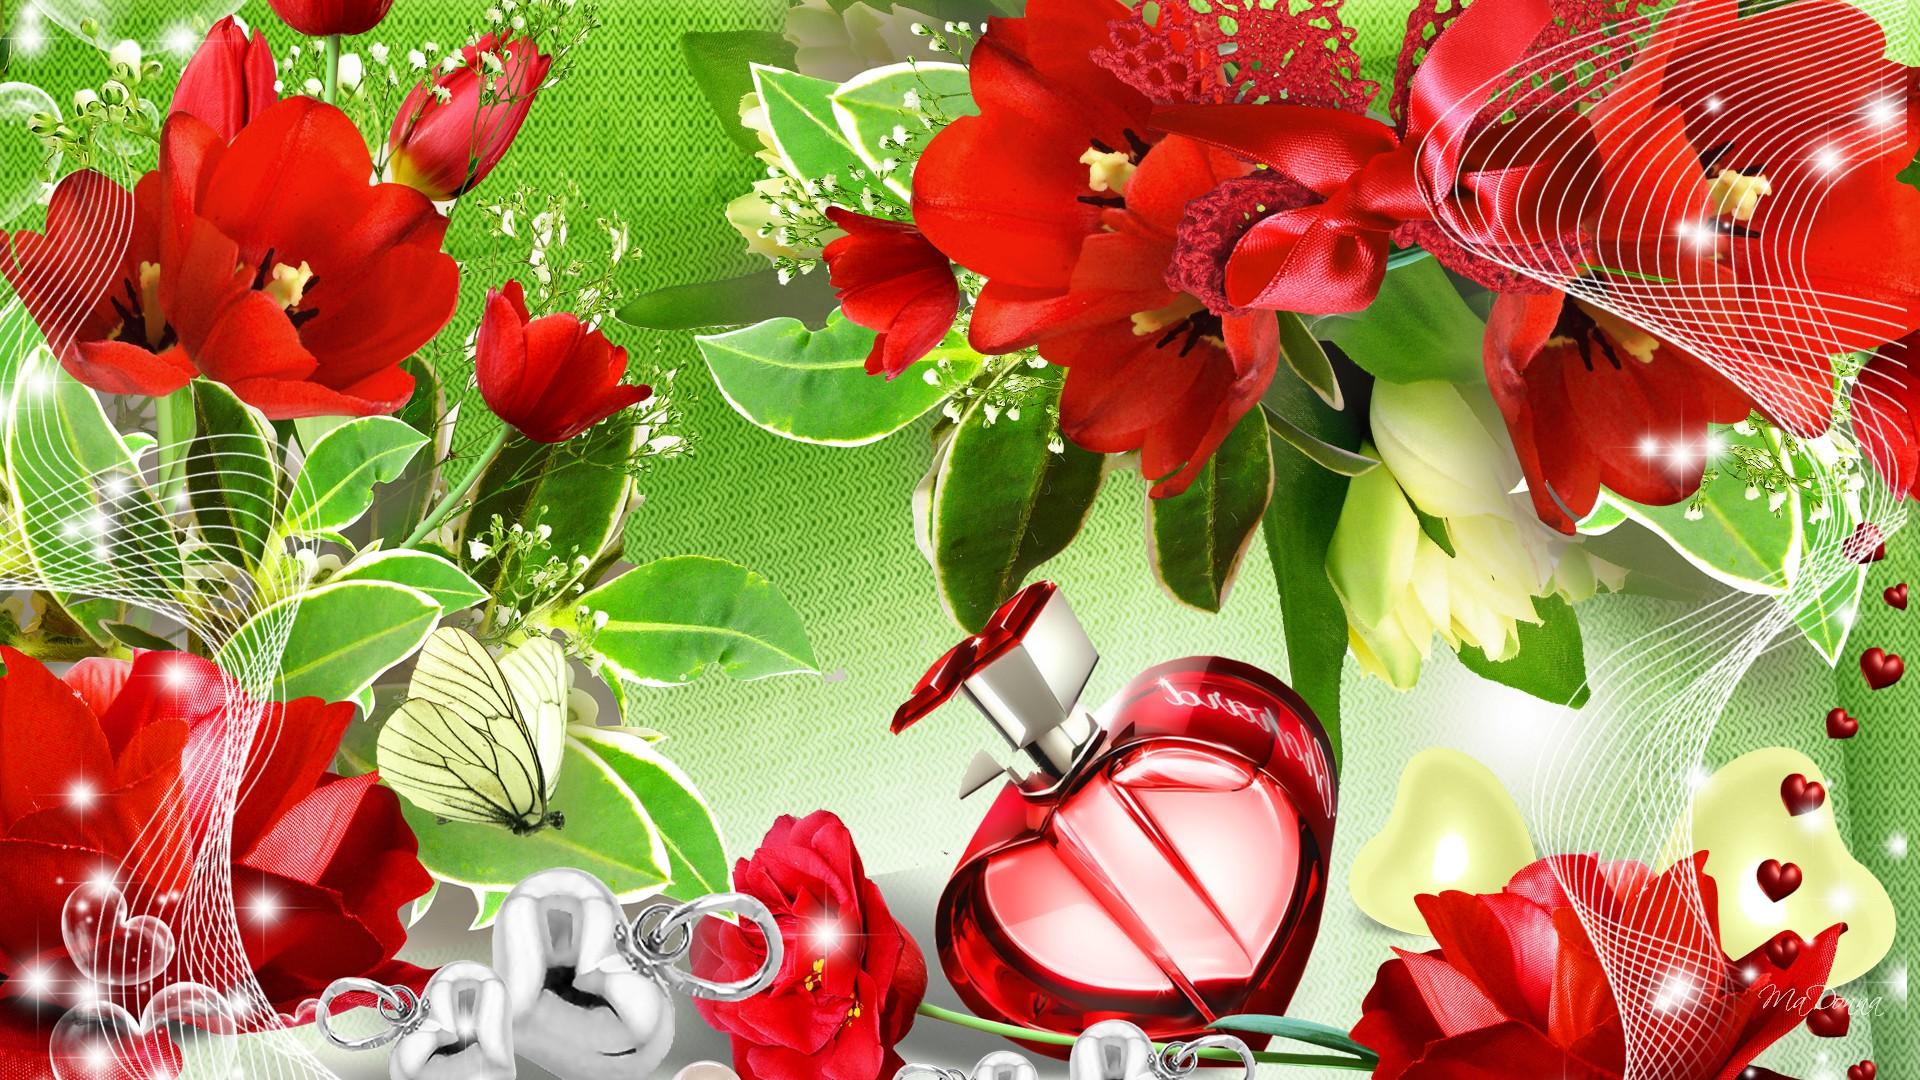 Beautiful Red Roses Free Hd Wallpaper Spring Season Hd Wallpaper